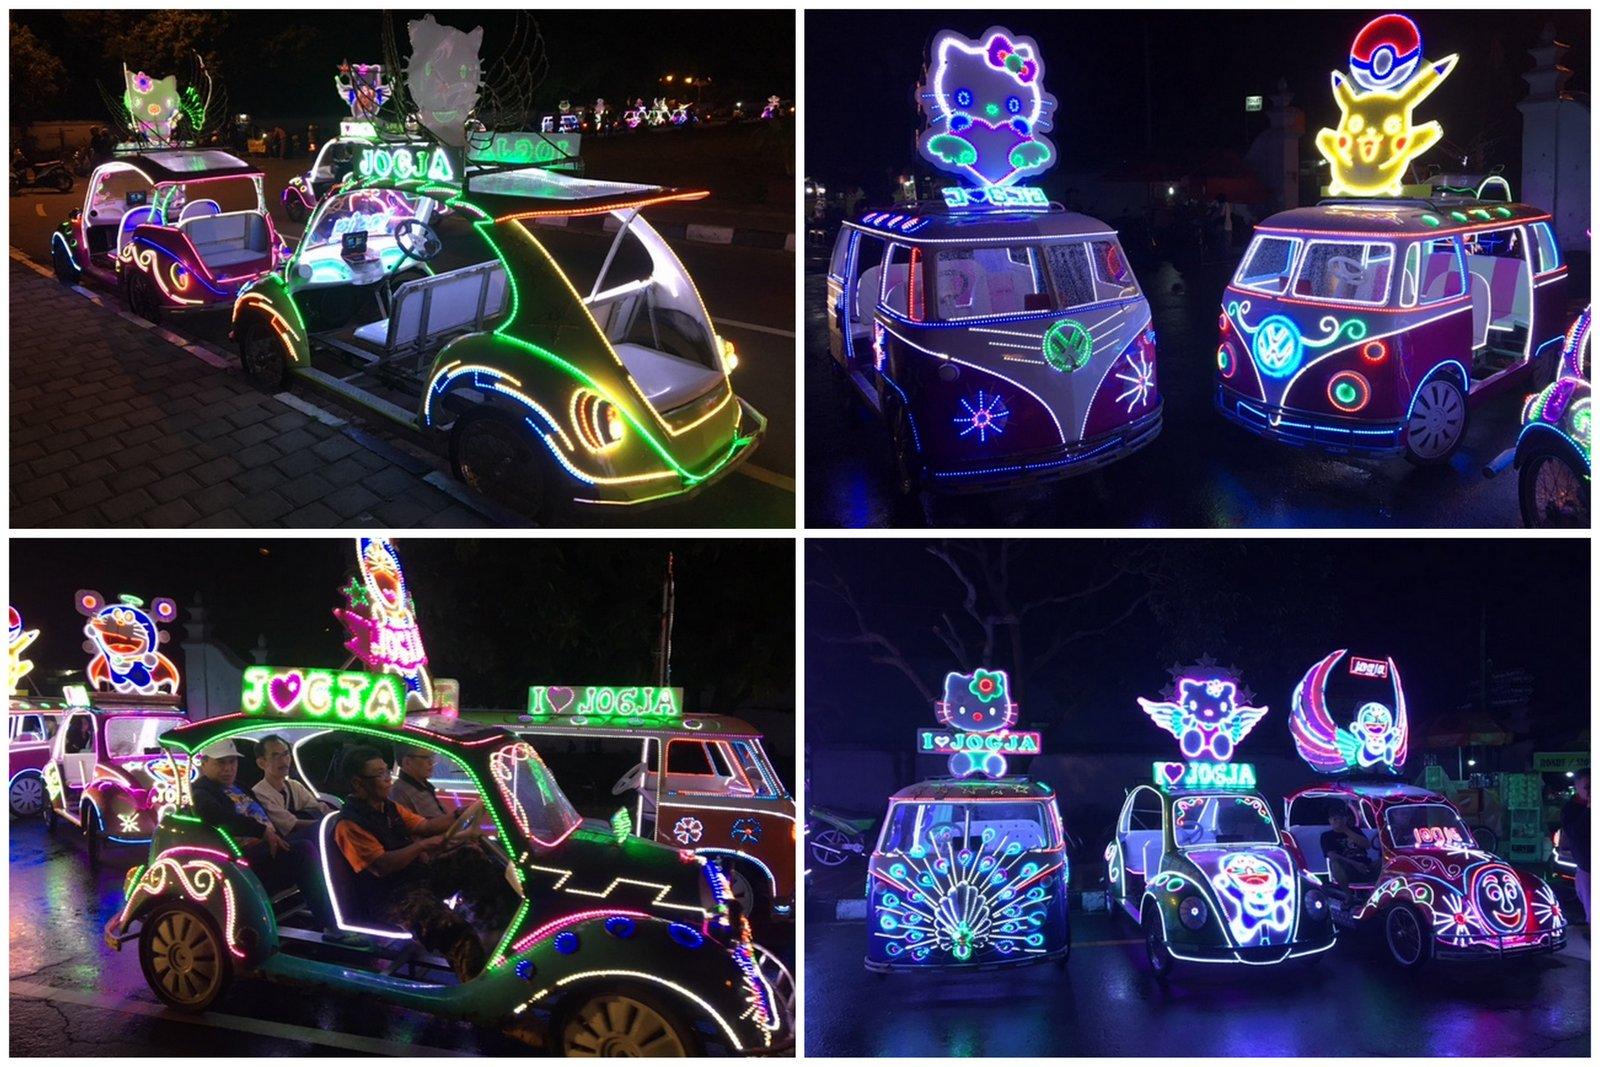 yogyakarta-bling-bling-coches